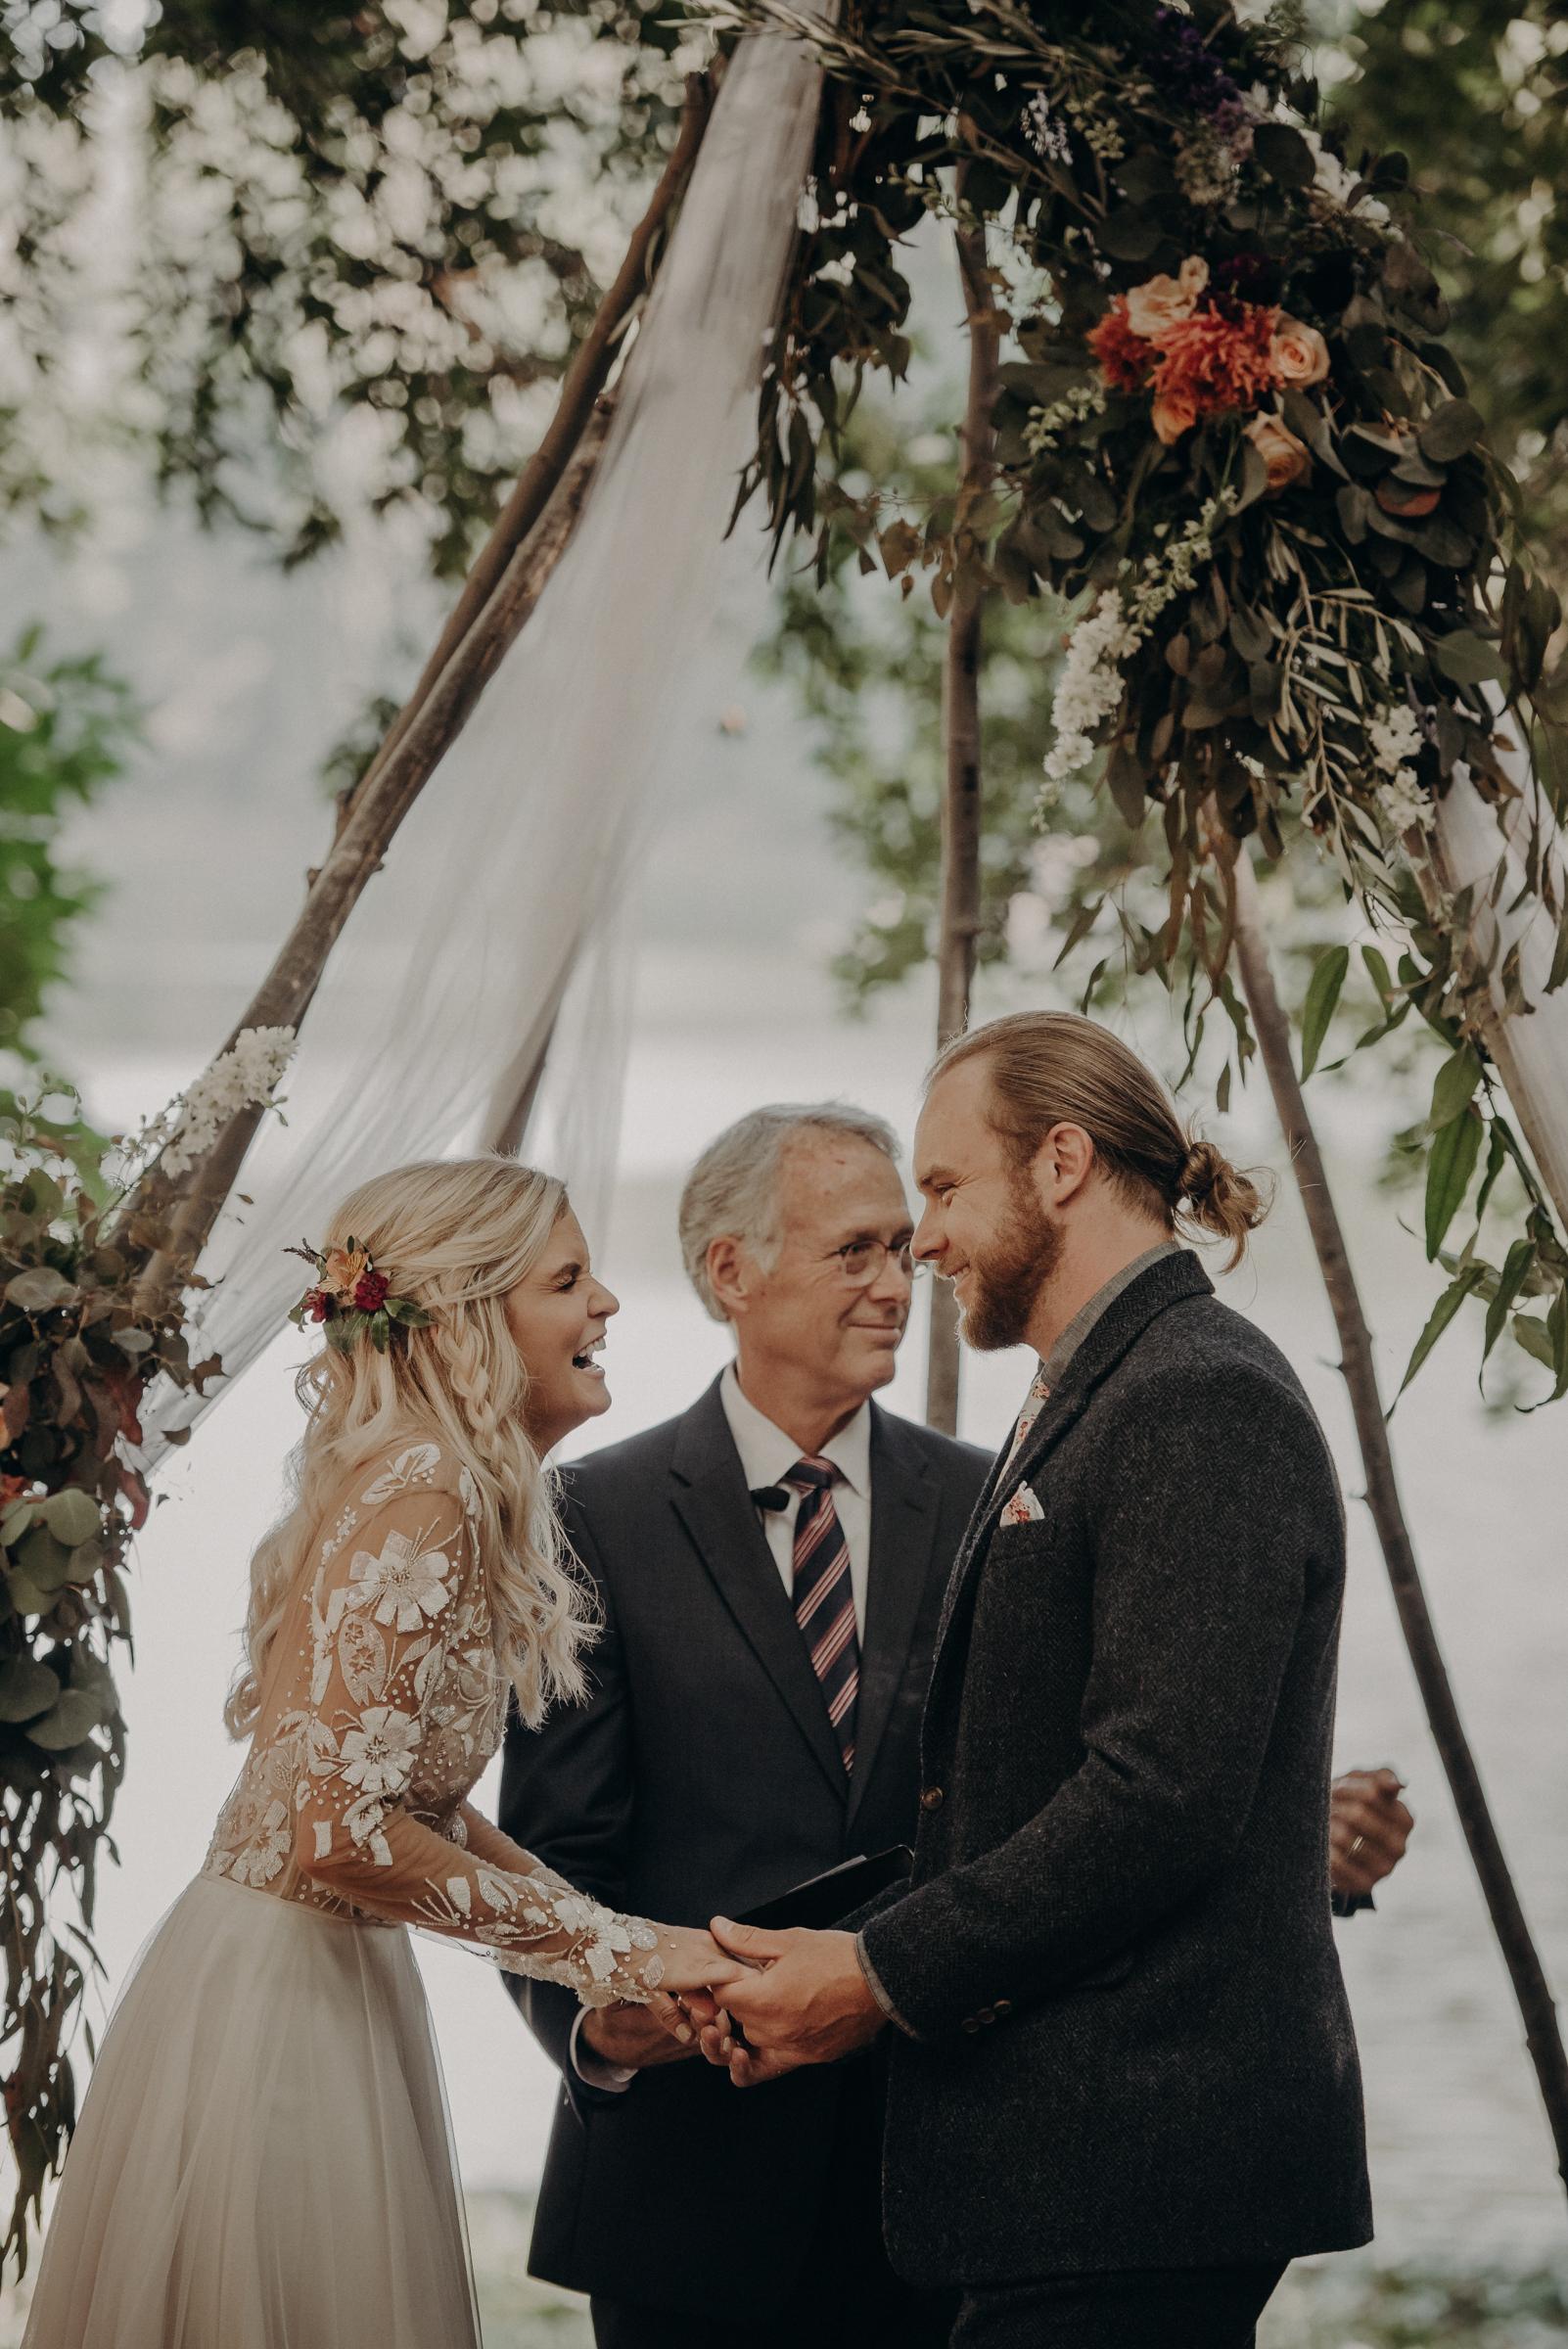 IsaiahAndTaylor.com - California Destination Elopement, Lake Leonard Reserve Wedding, Ukiah-107.jpg